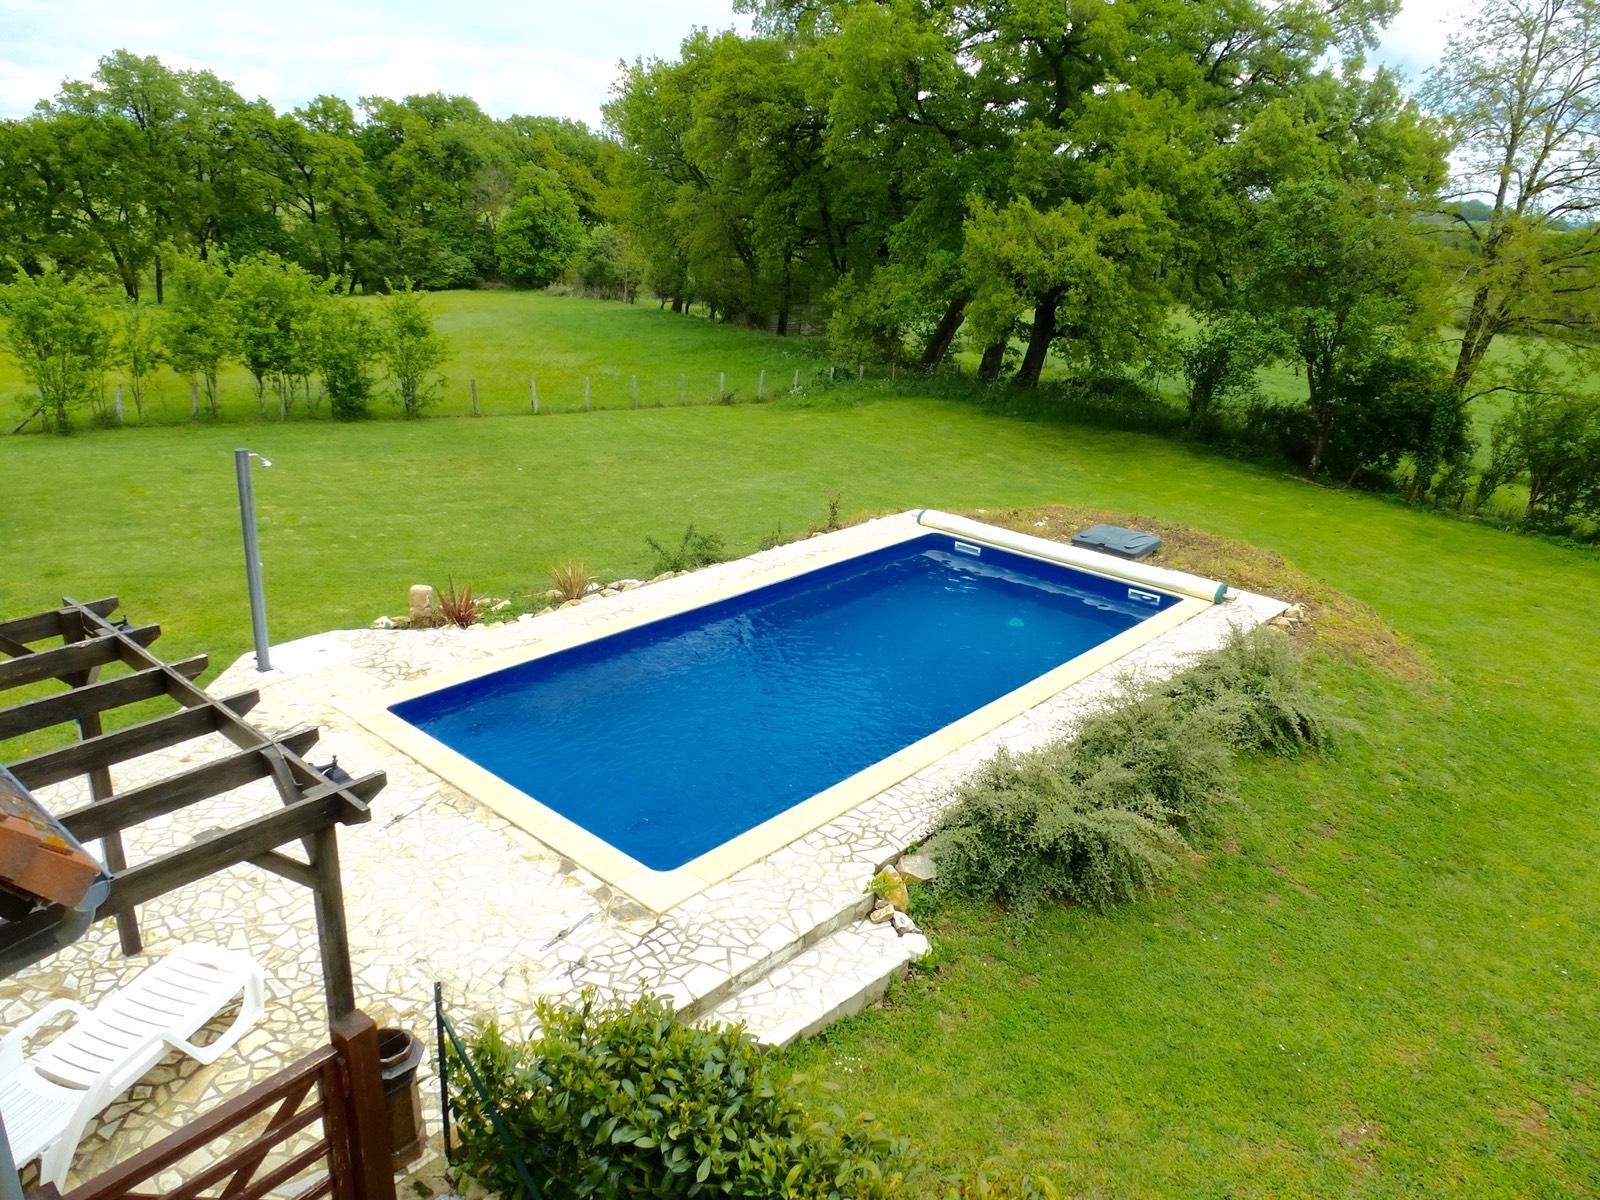 Immobilier figeac art et maisons 1042 superbe for Camping figeac avec piscine